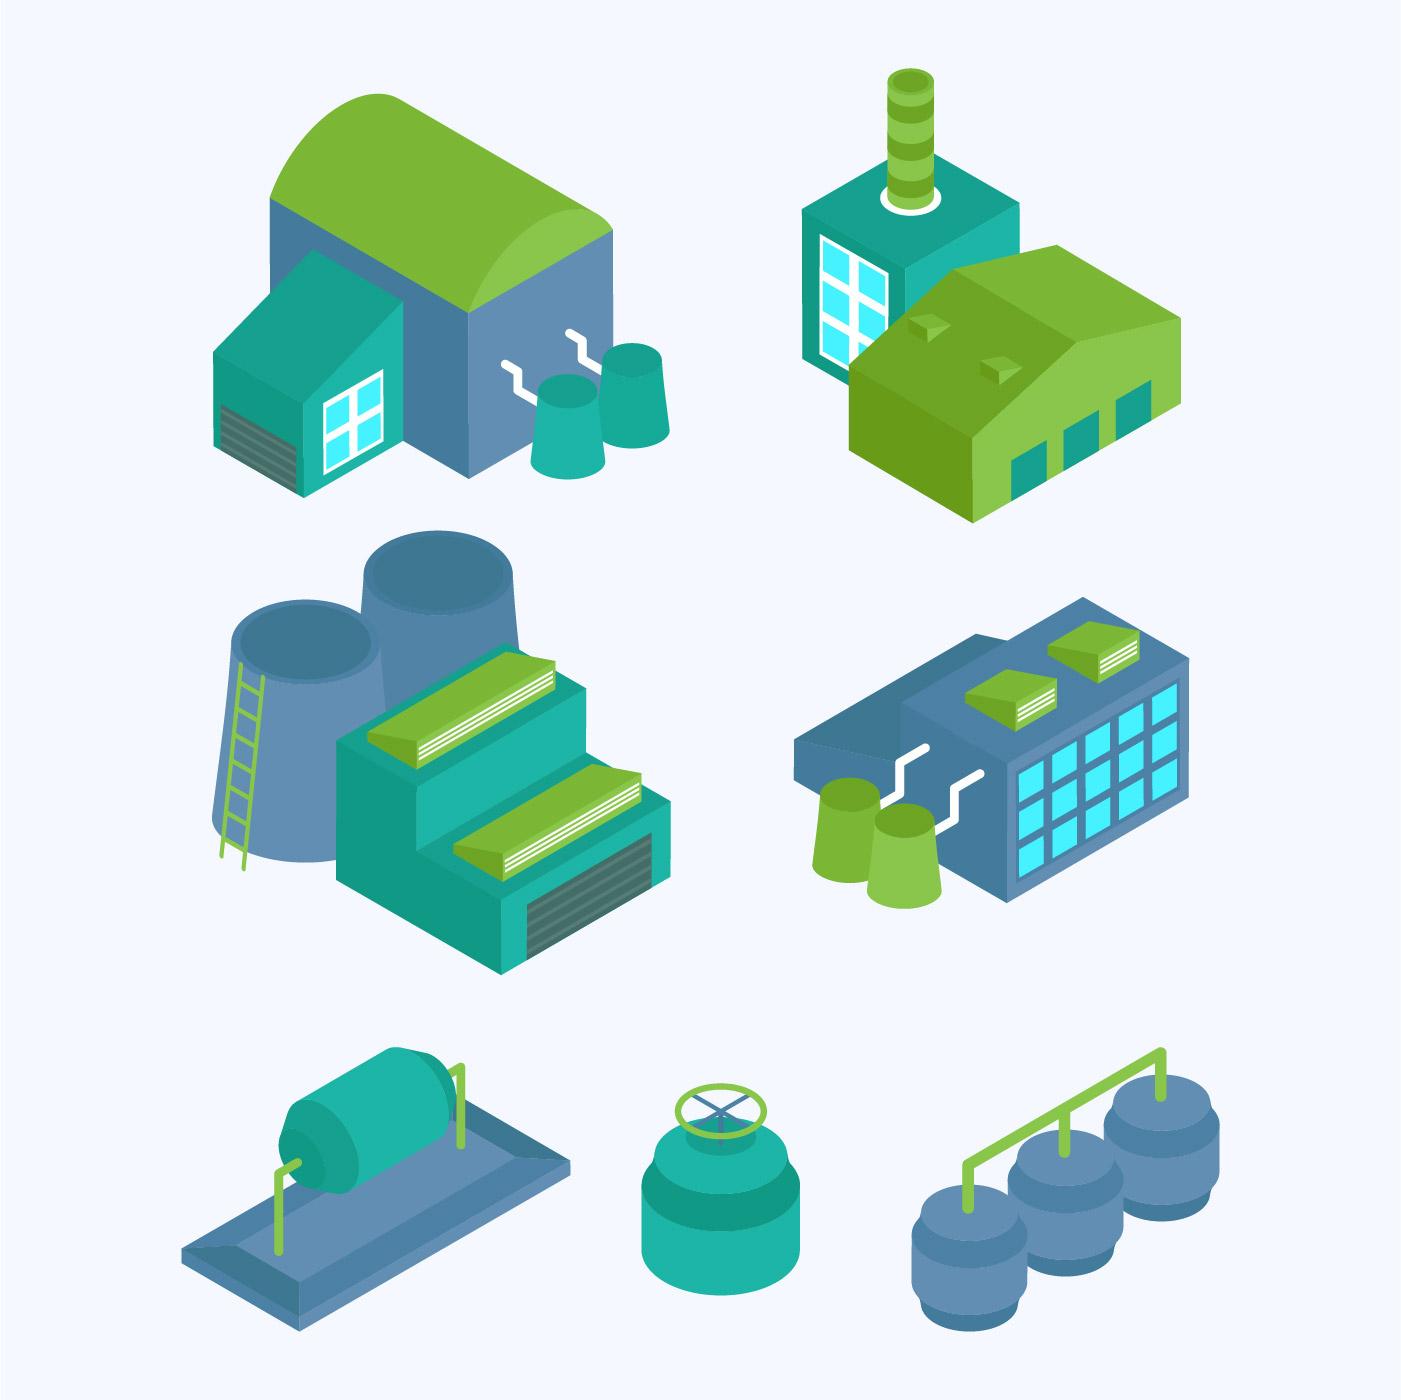 isometric industrial buildings set - Download Free Vectors, Clipart Graphics & Vector Art